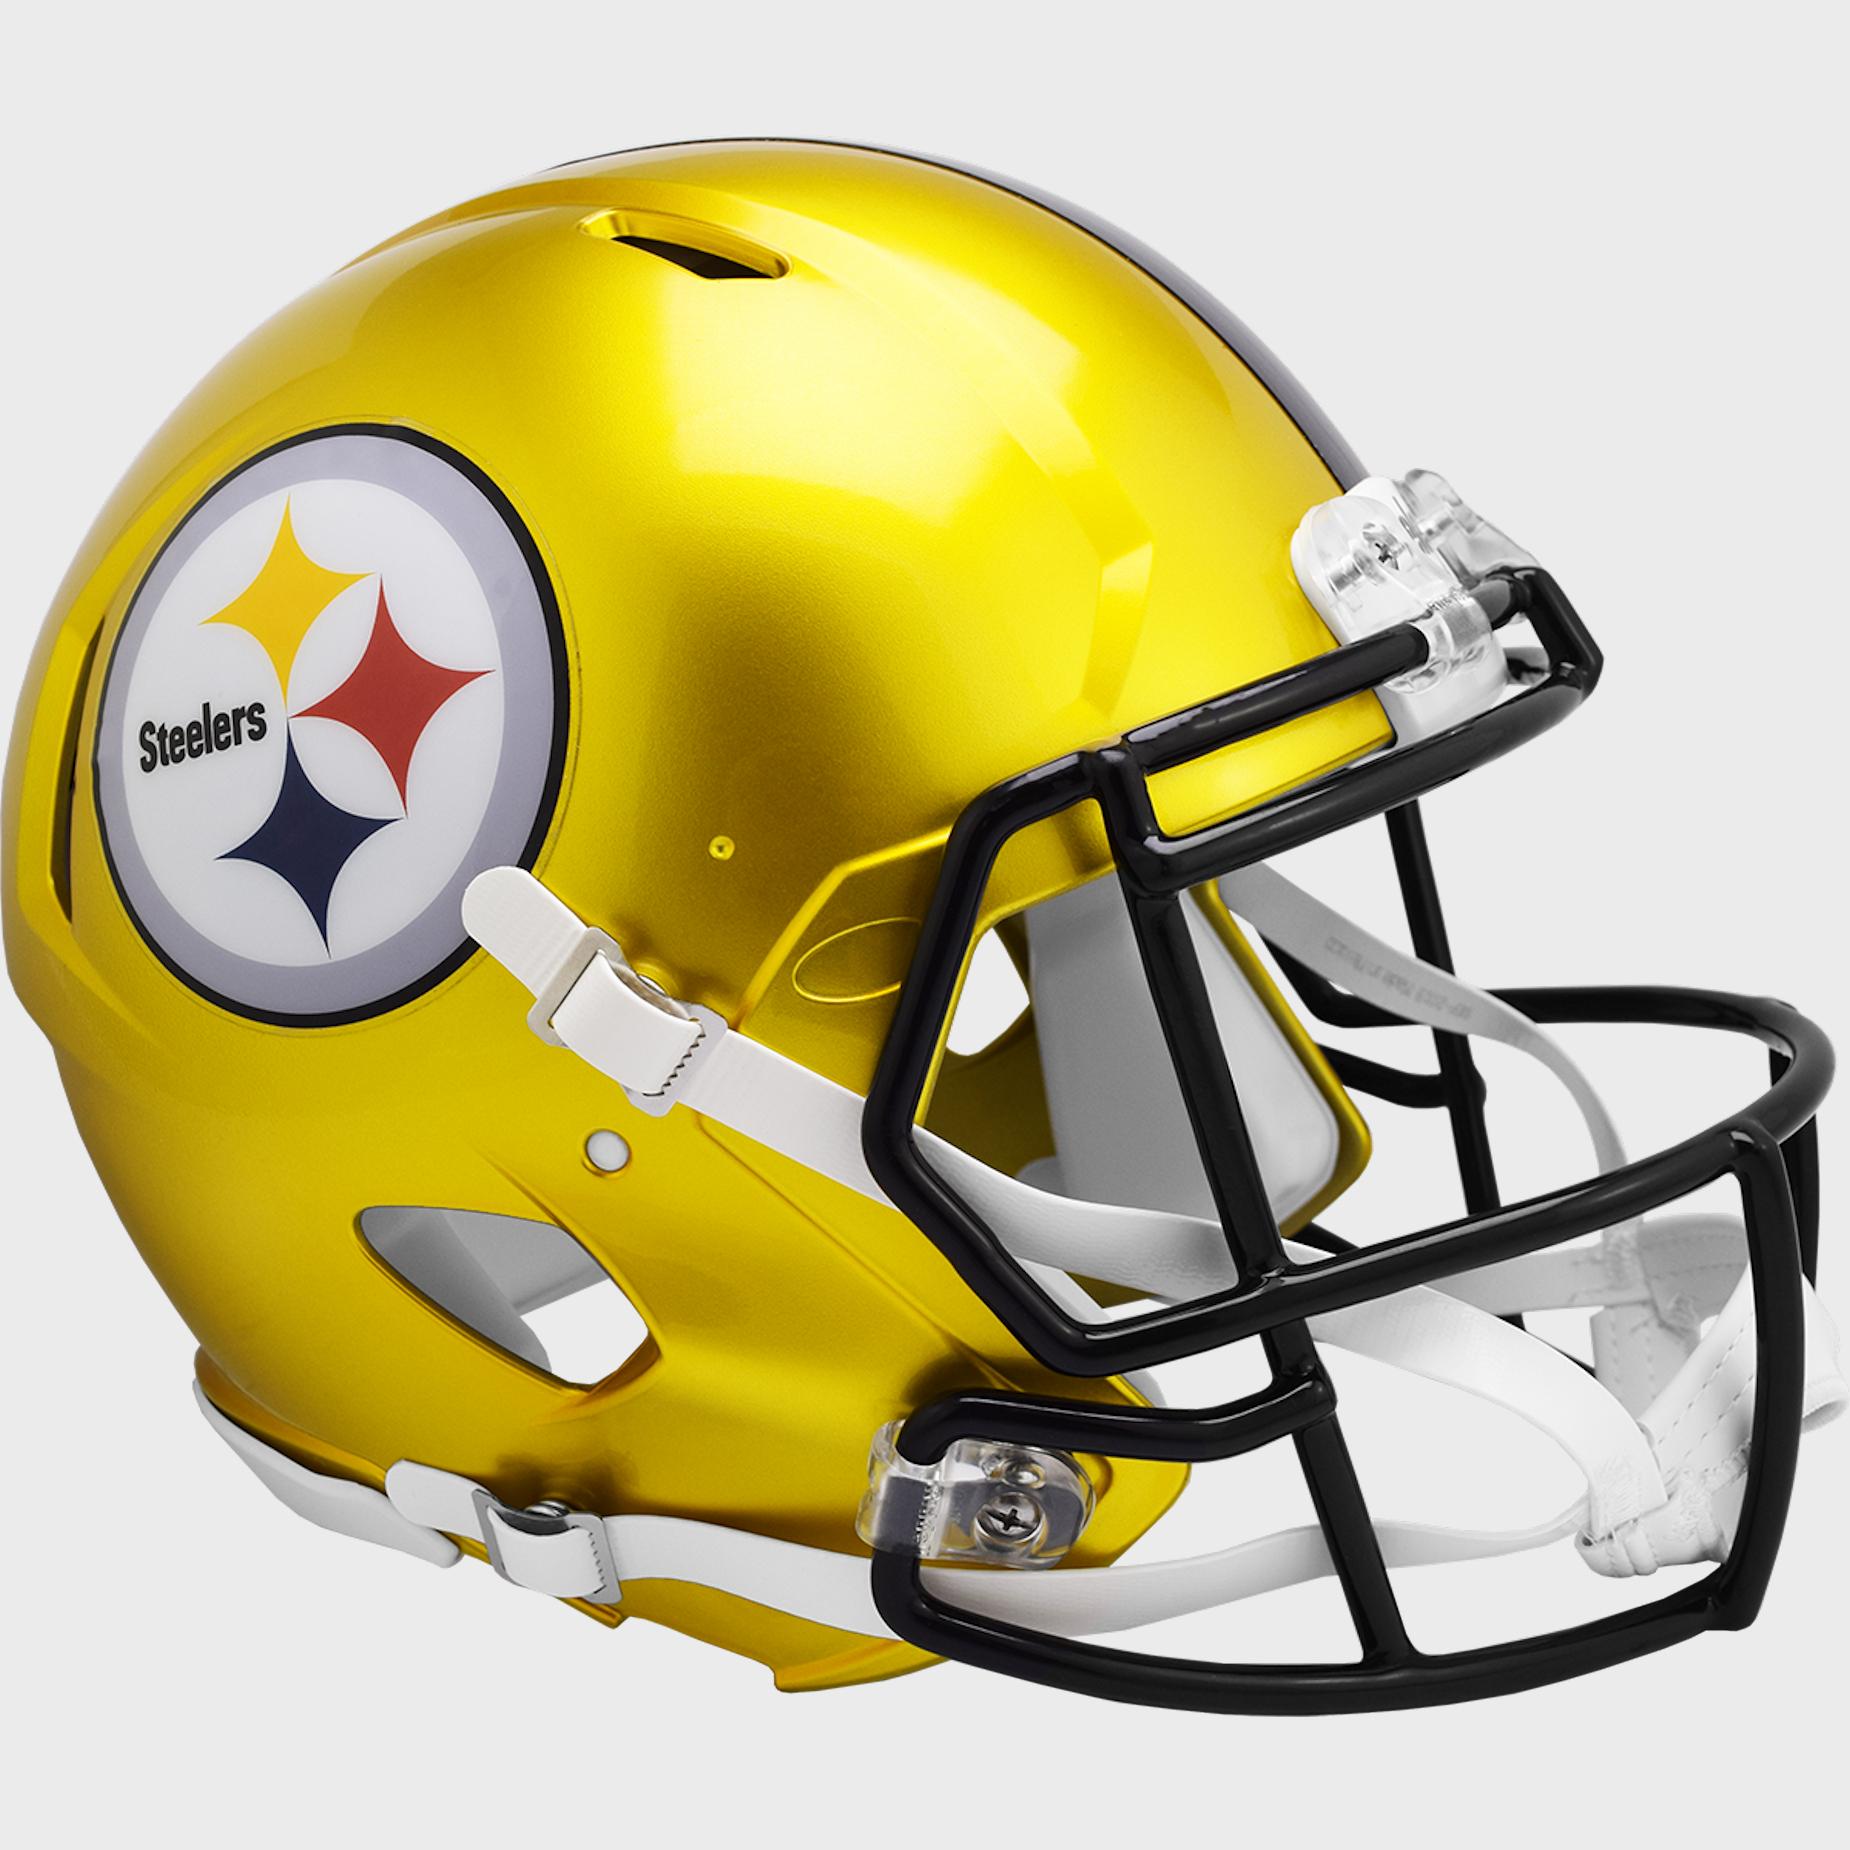 Pittsburgh Steelers Speed Football Helmet <B>FLASH ESD 8/21/21</B>